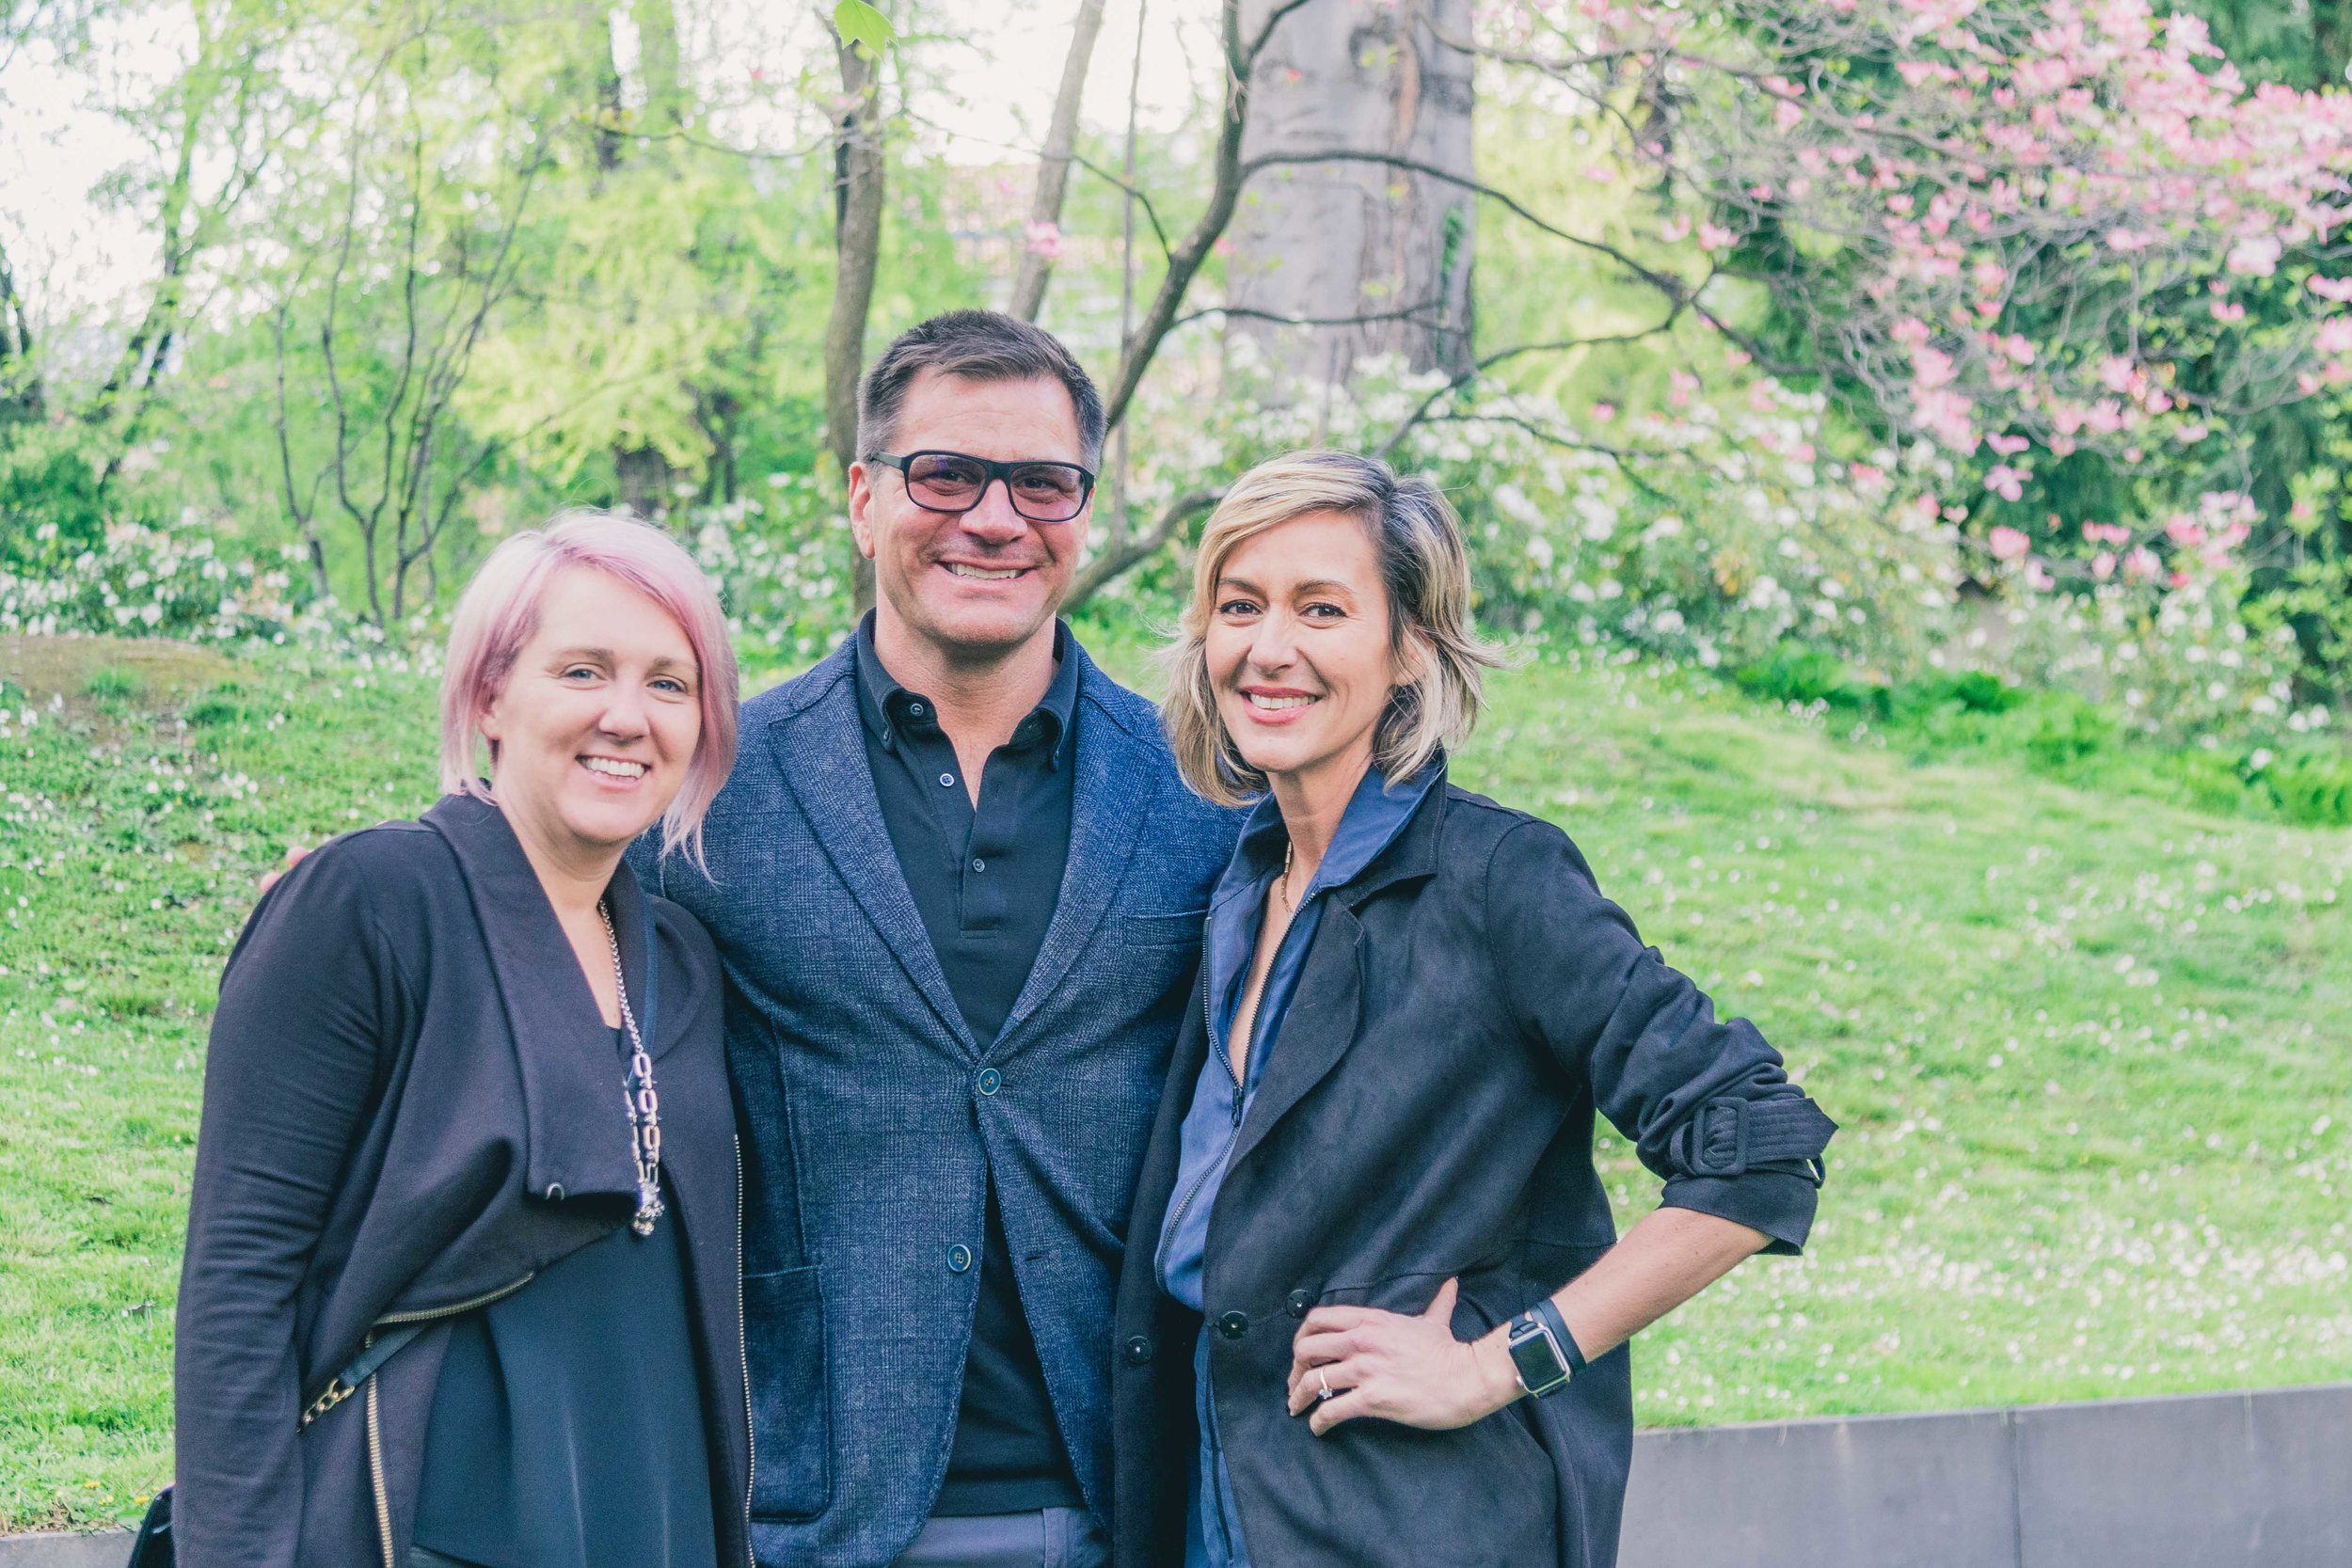 Tracy Hiner, Stephan Jones and Ginna Christensen